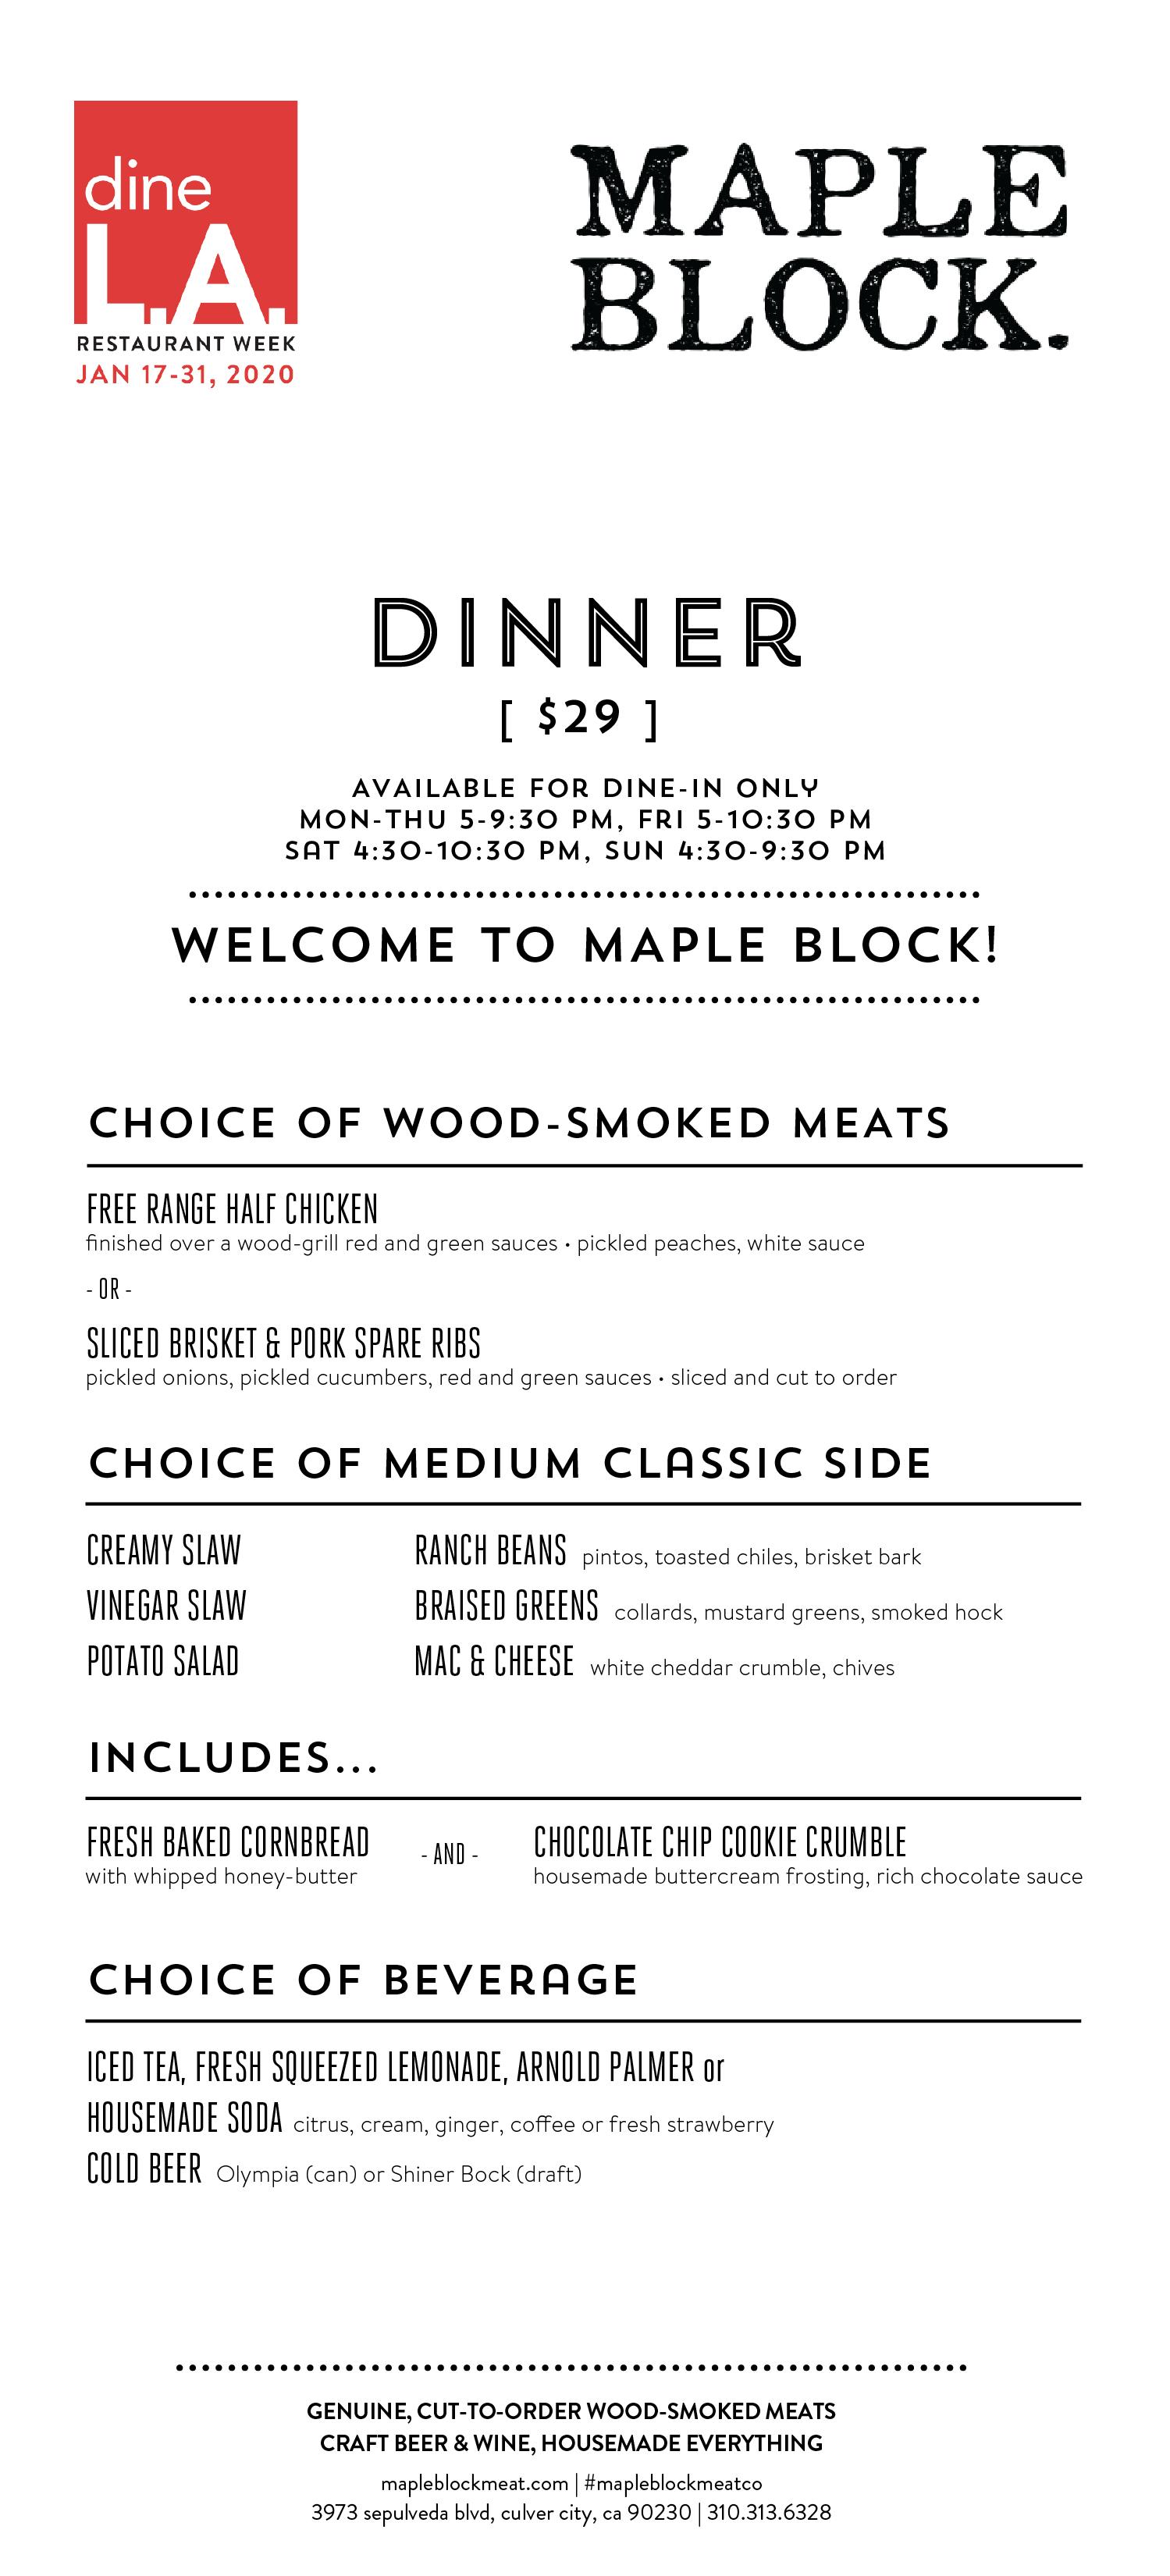 dineLA Restaurant Week - Maple Block Dinner Menu Winter 2020